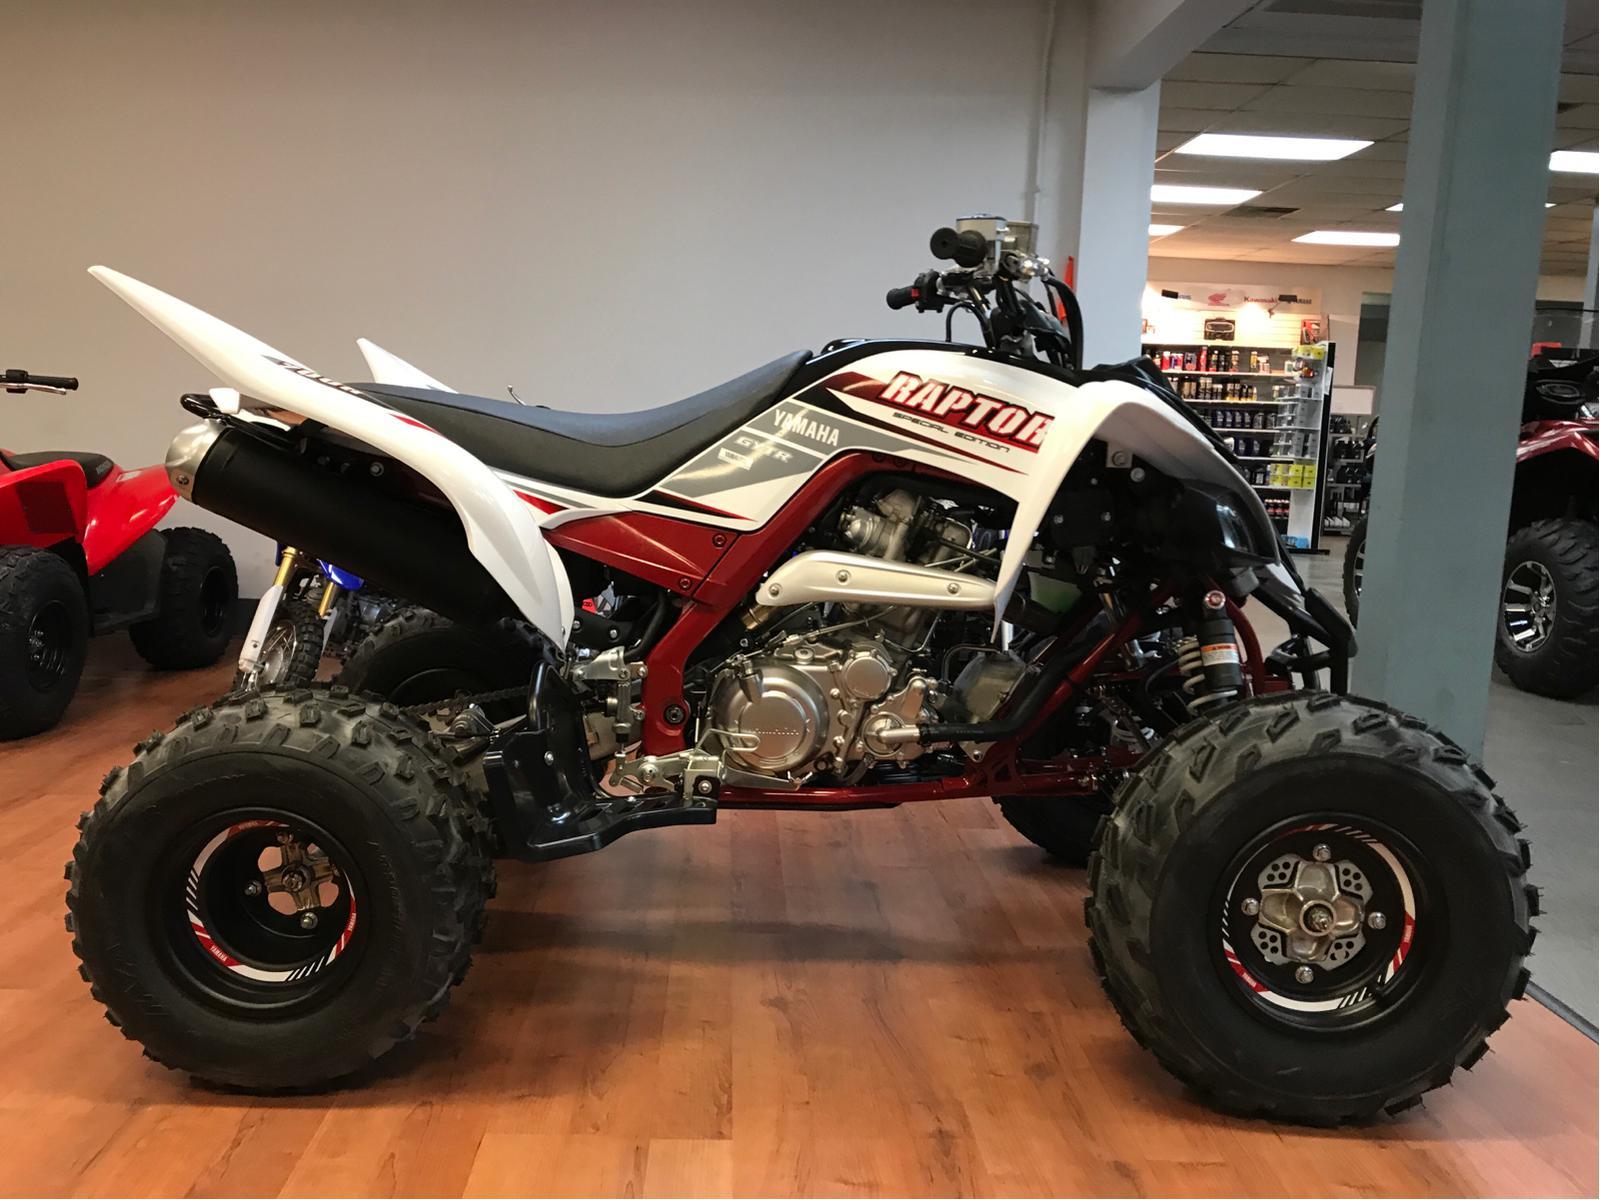 2018 Yamaha RAPTOR 700R SE for sale in Urbana, IL | Sportland